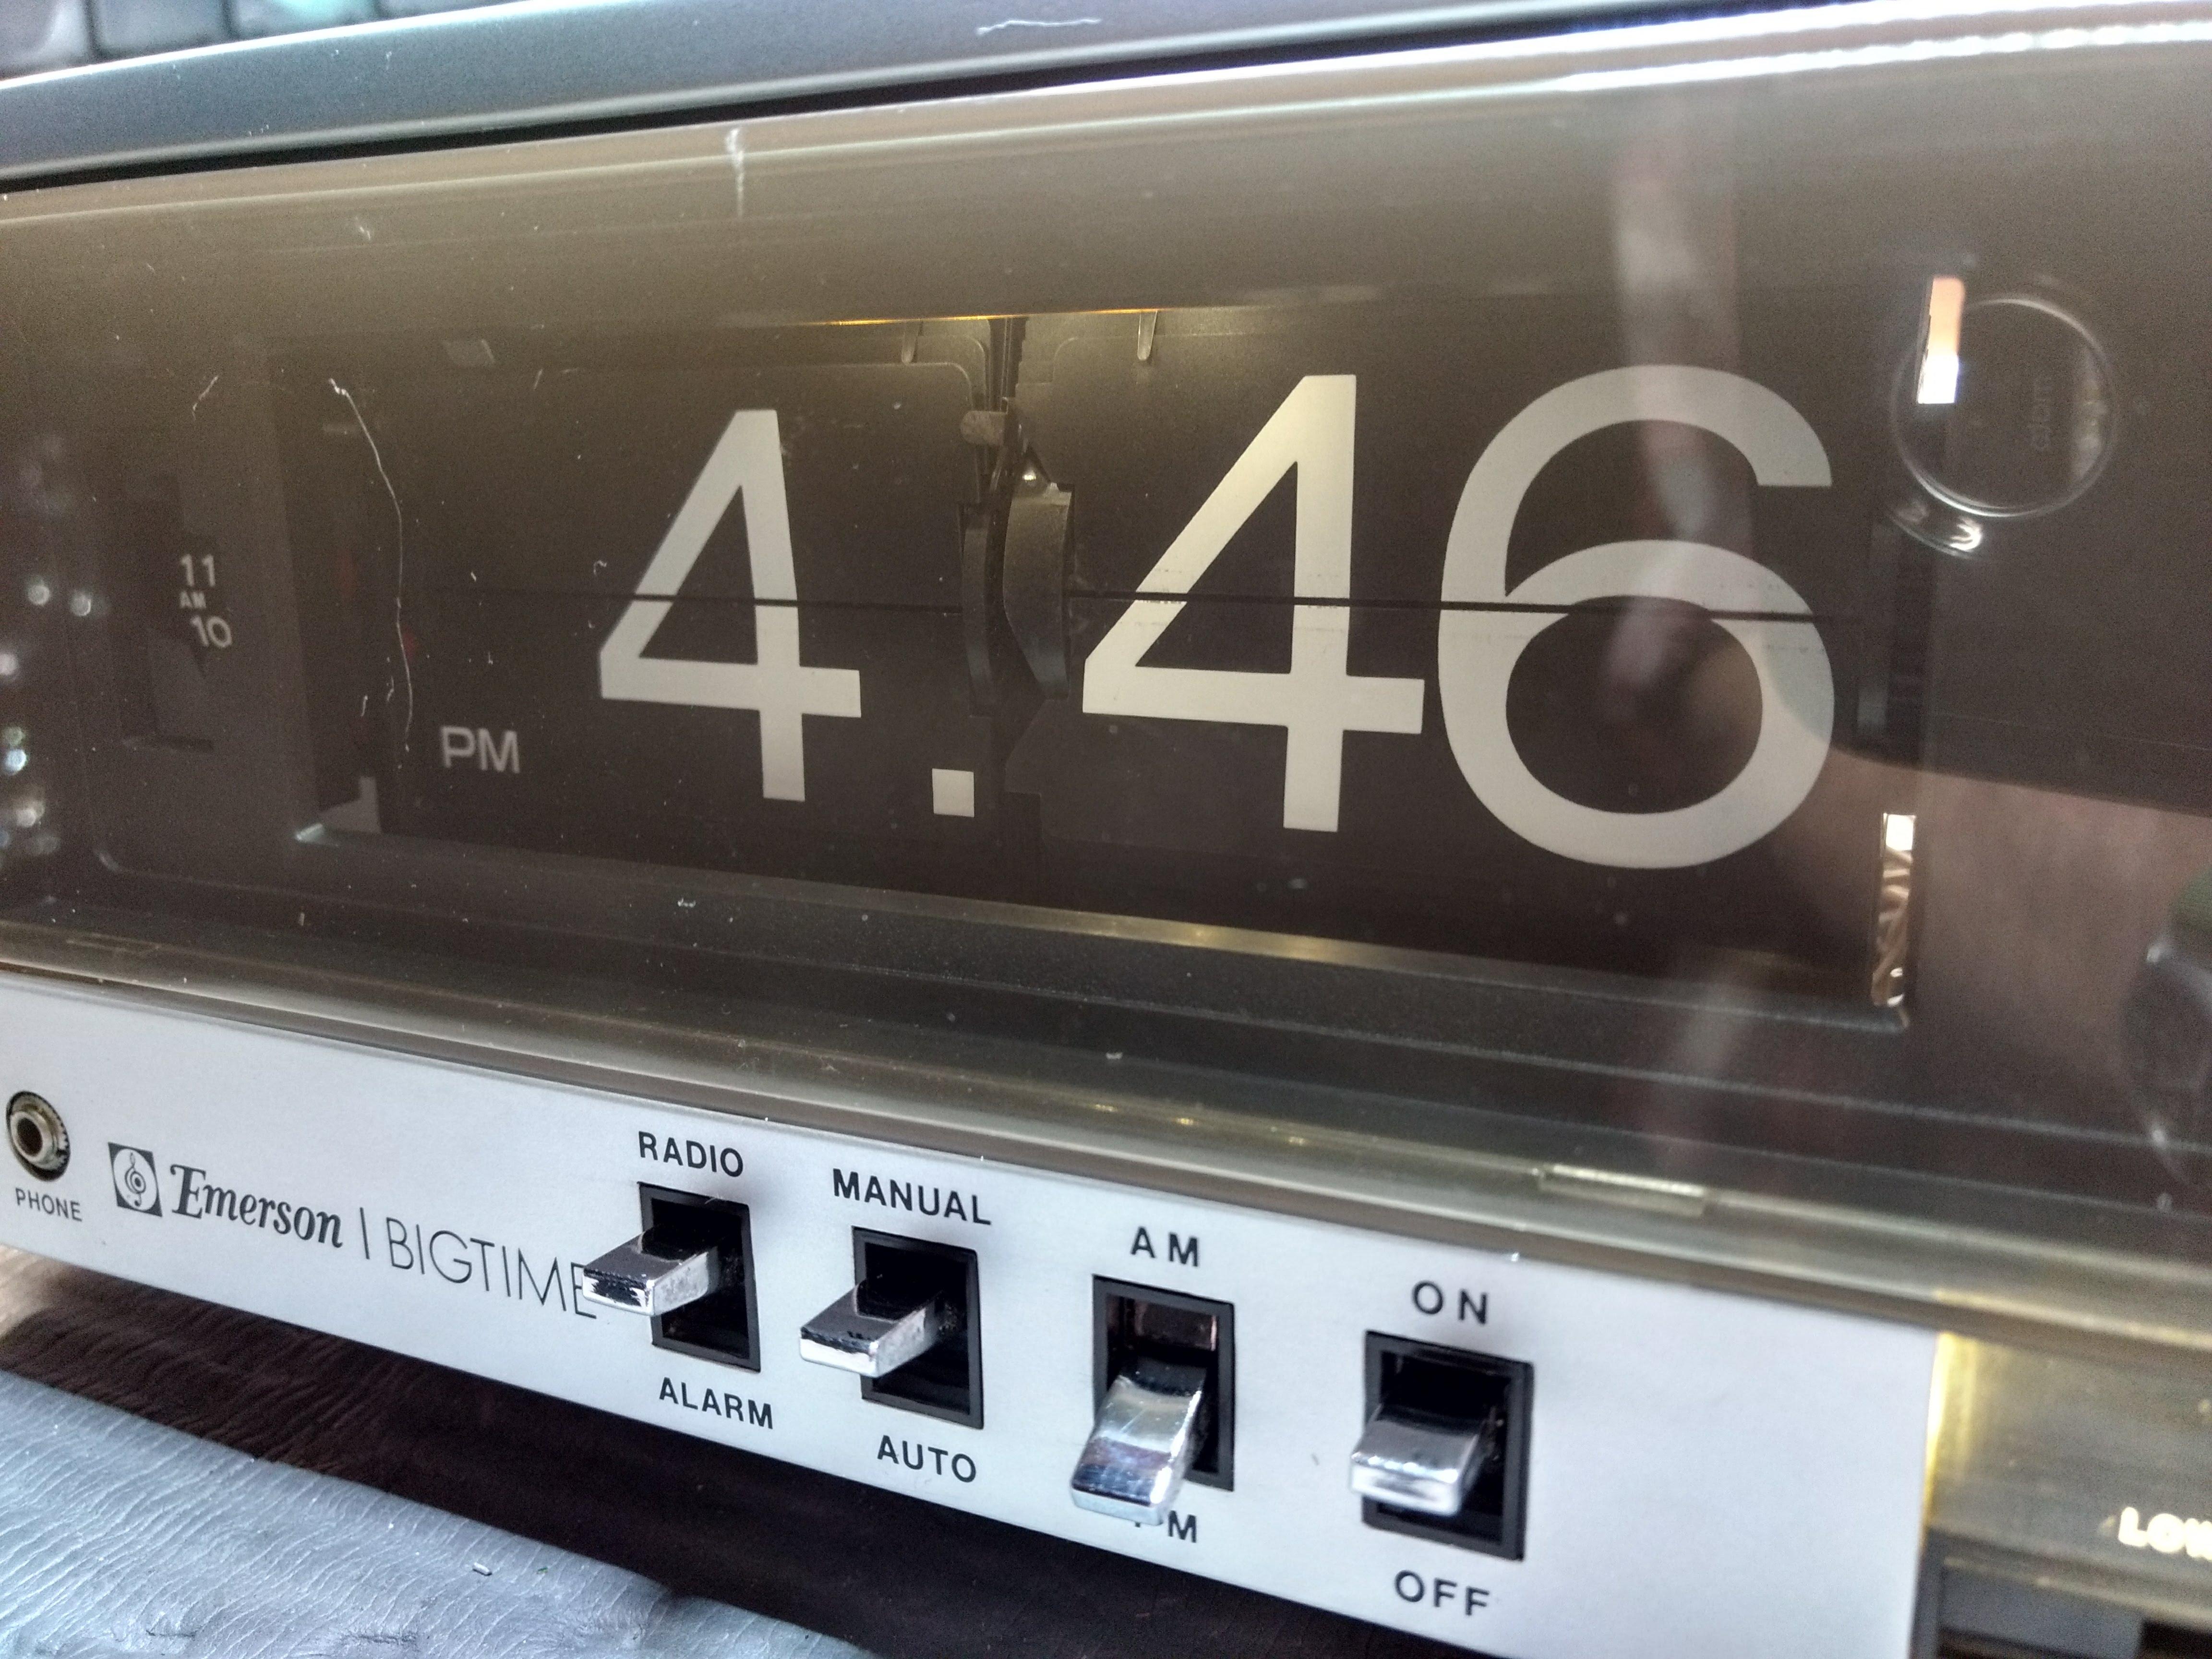 Emerson Flip Clock LED display